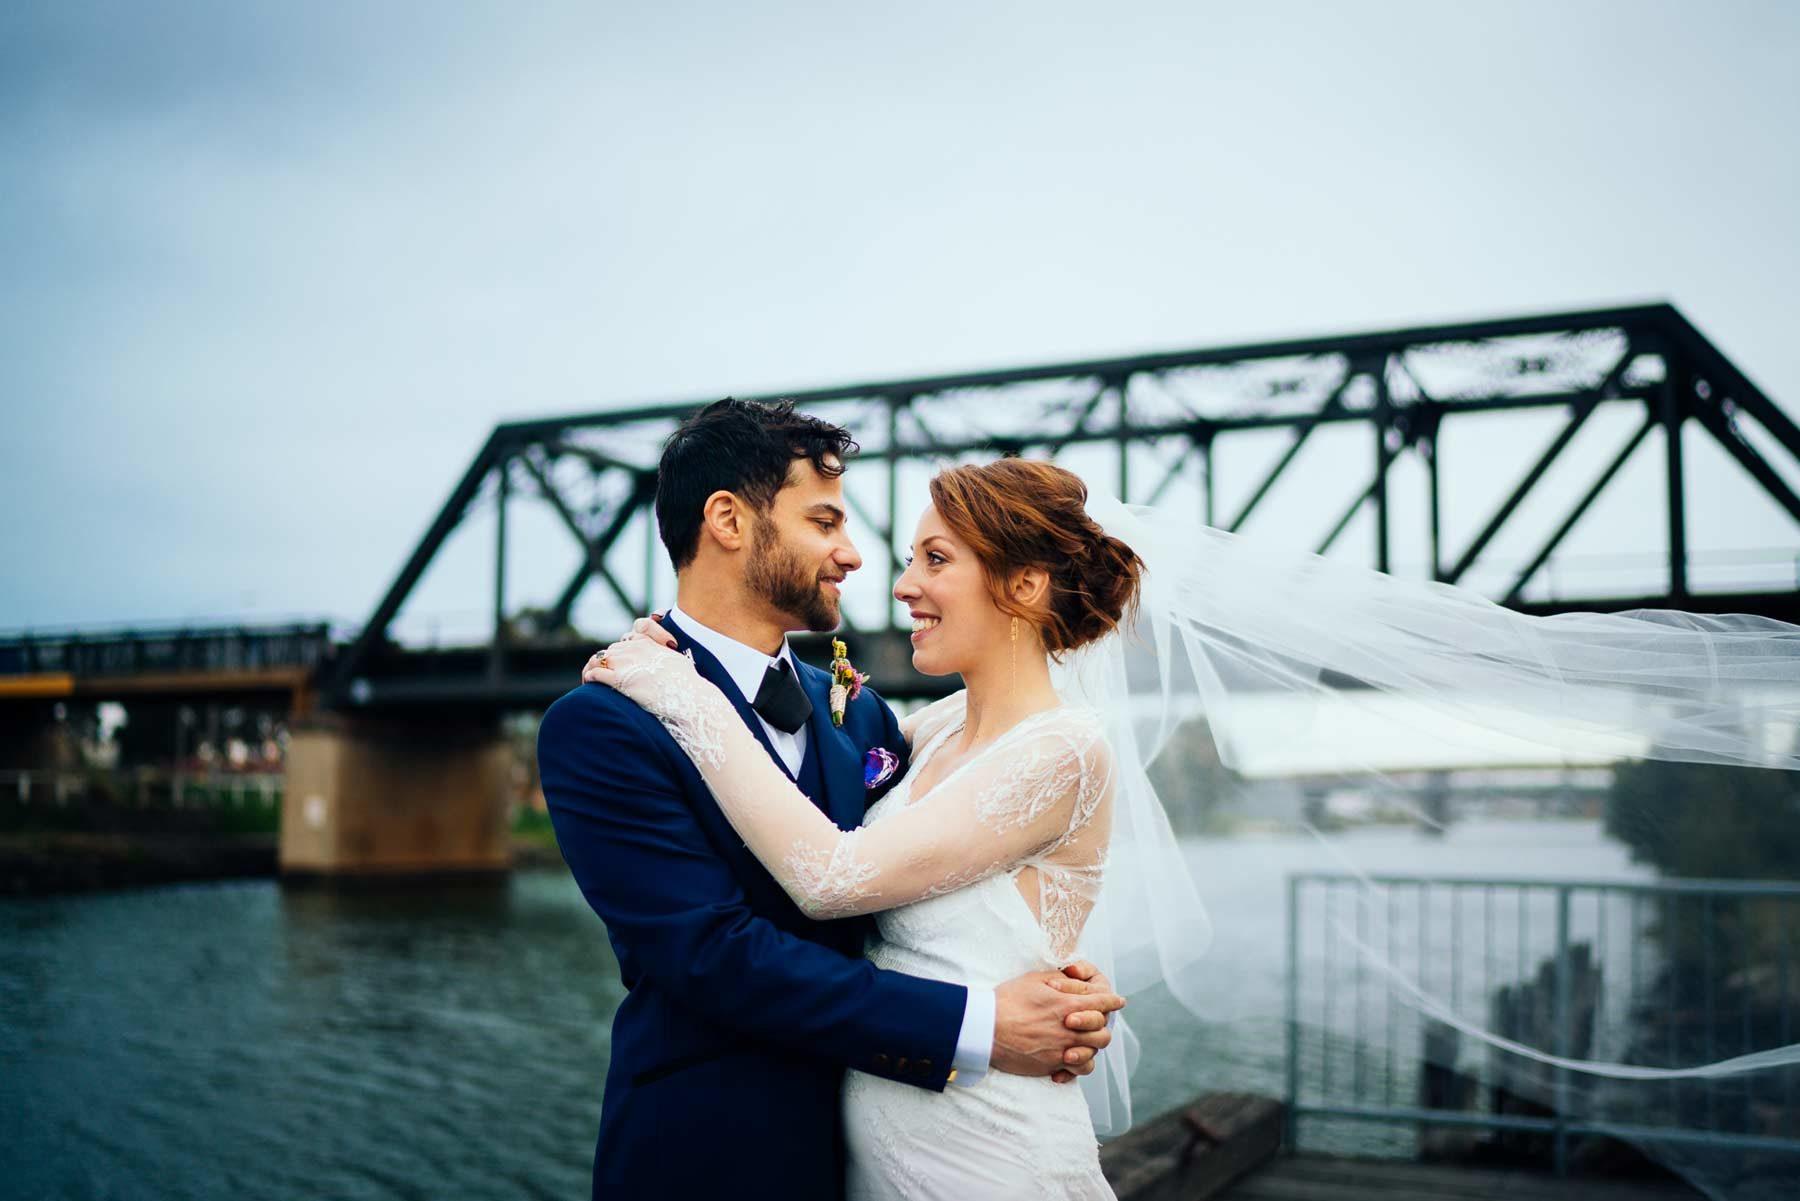 Melbourne wedding photographer Australia